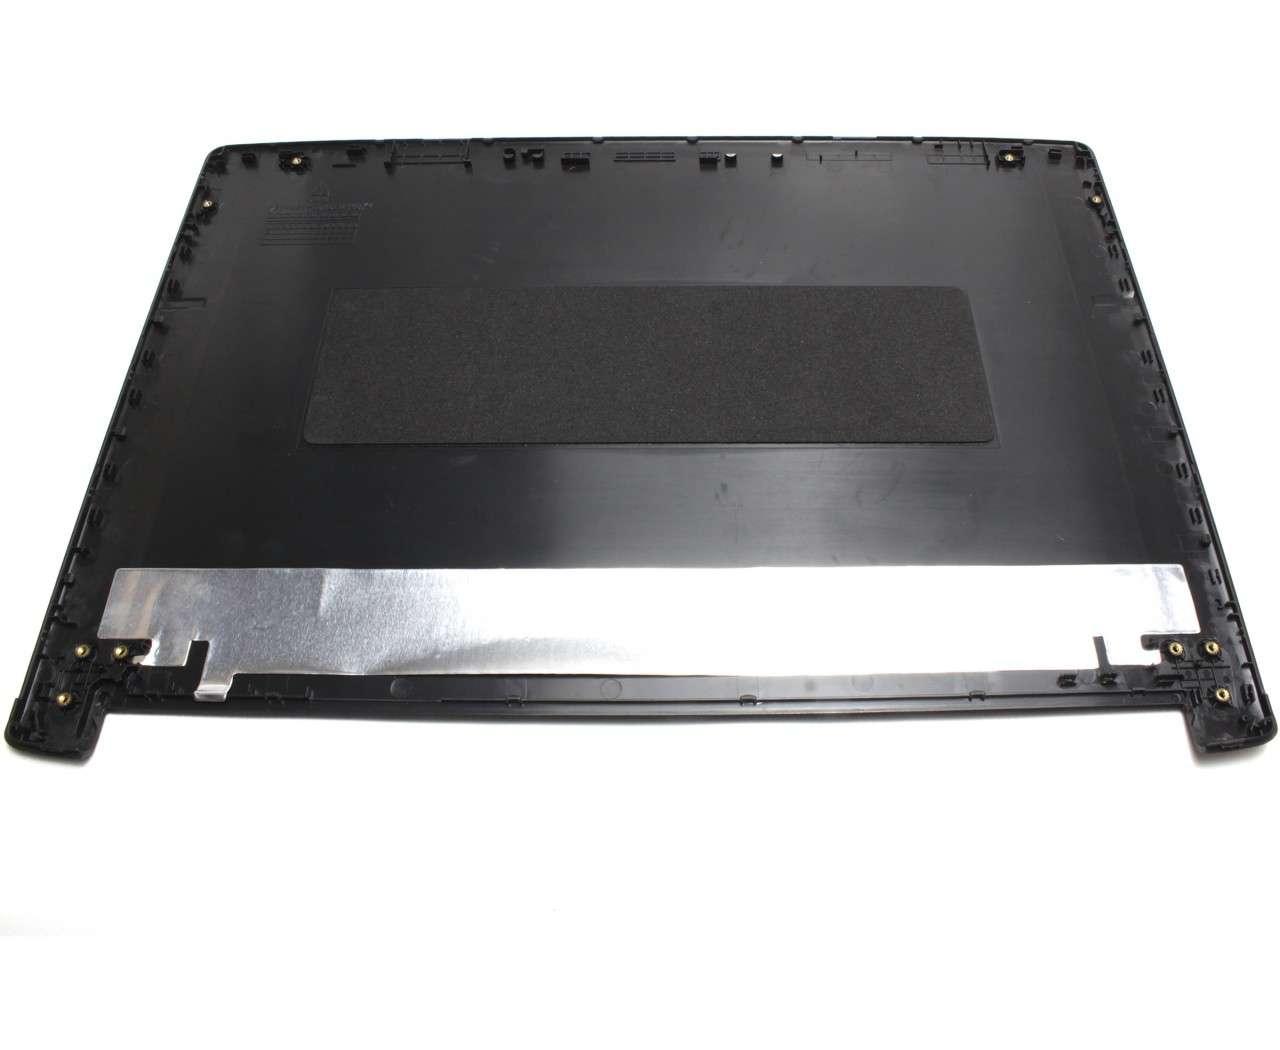 Capac Display BackCover Acer A715-71G Carcasa Display imagine powerlaptop.ro 2021